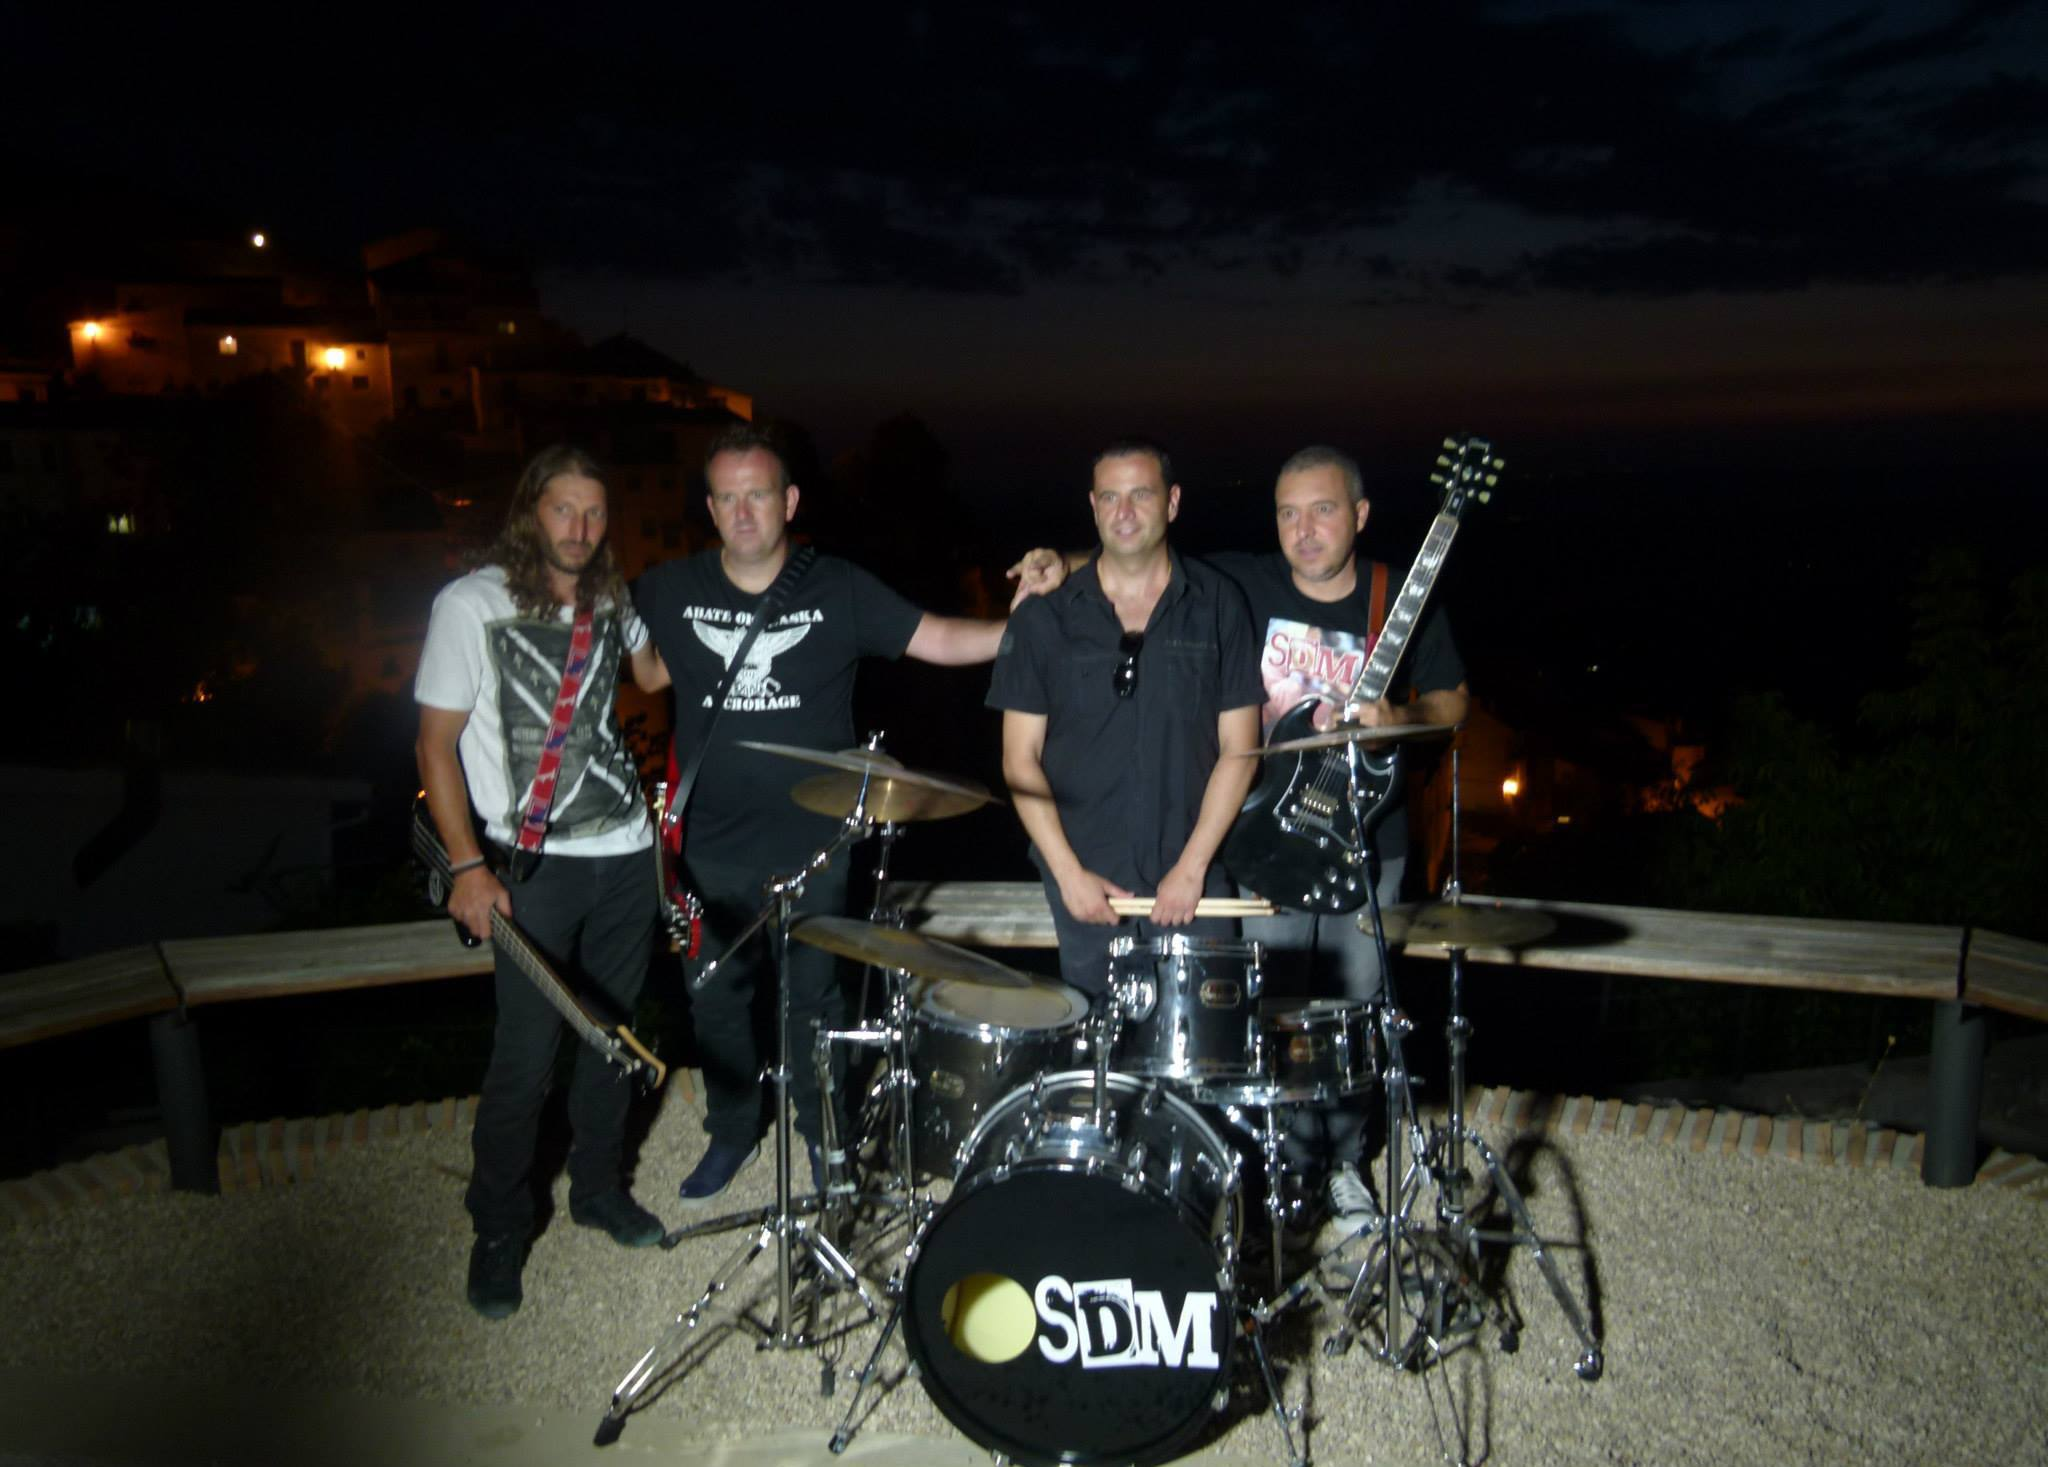 La banda Jienense SDM edita su primer disco al mercado.